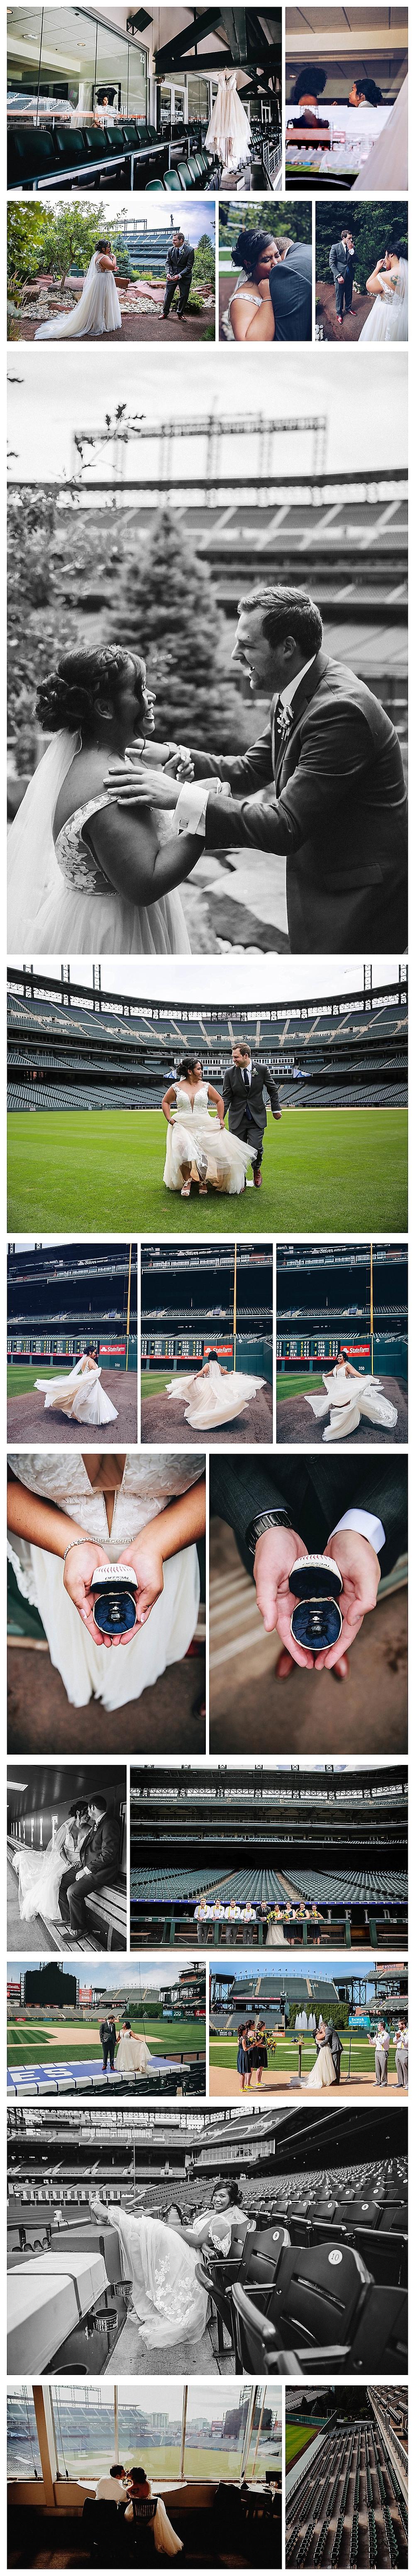 Coors Field Wedding Photographer